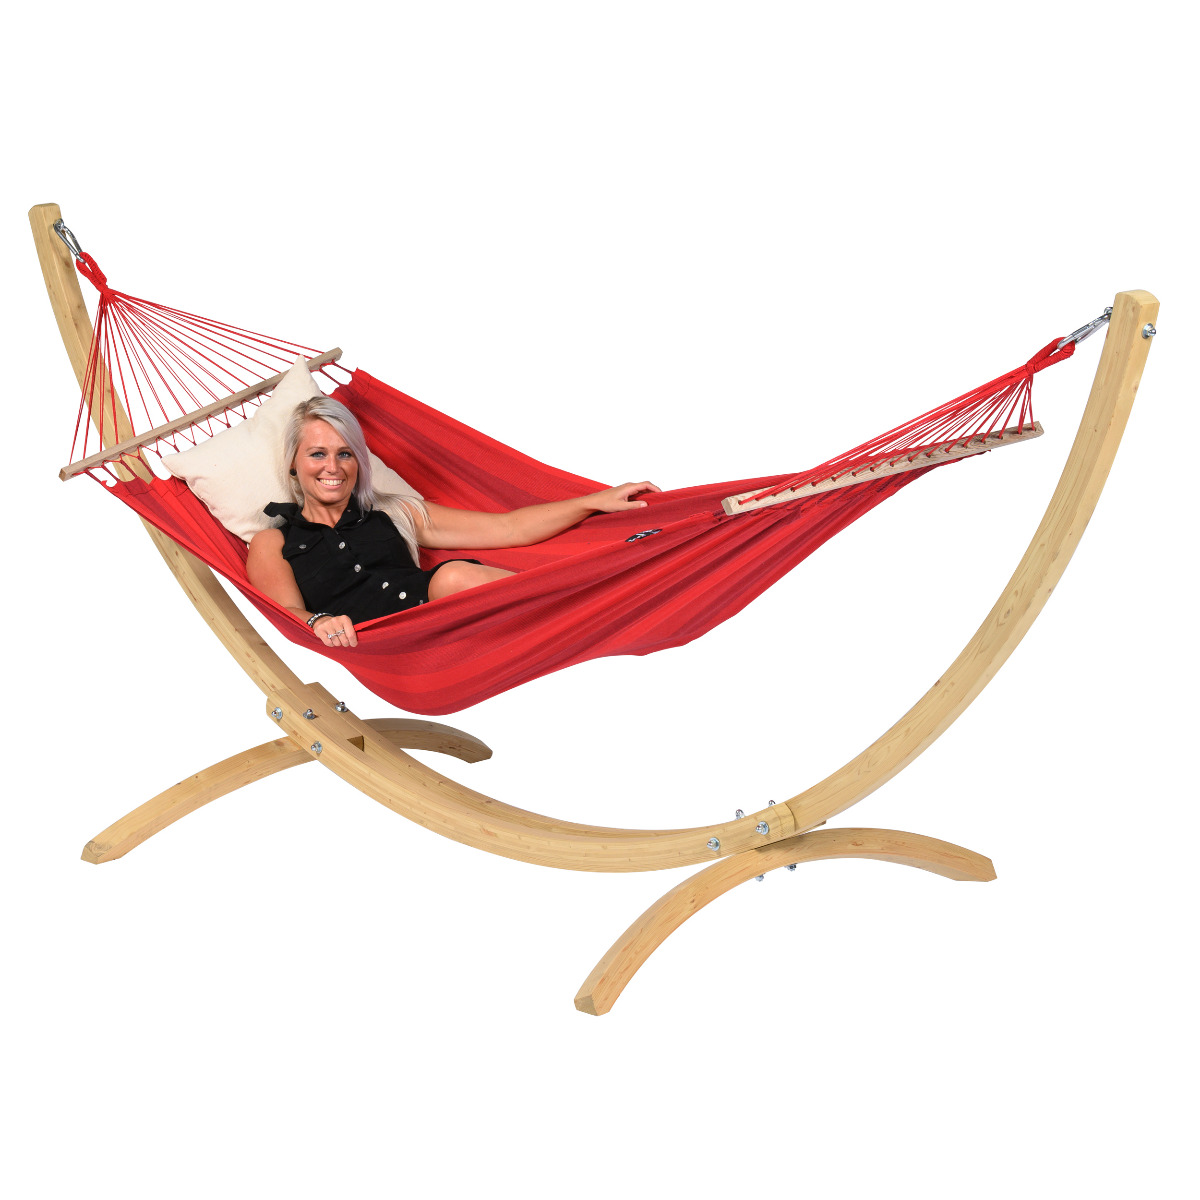 Hangmat 'Relax' Red - Tropilex �